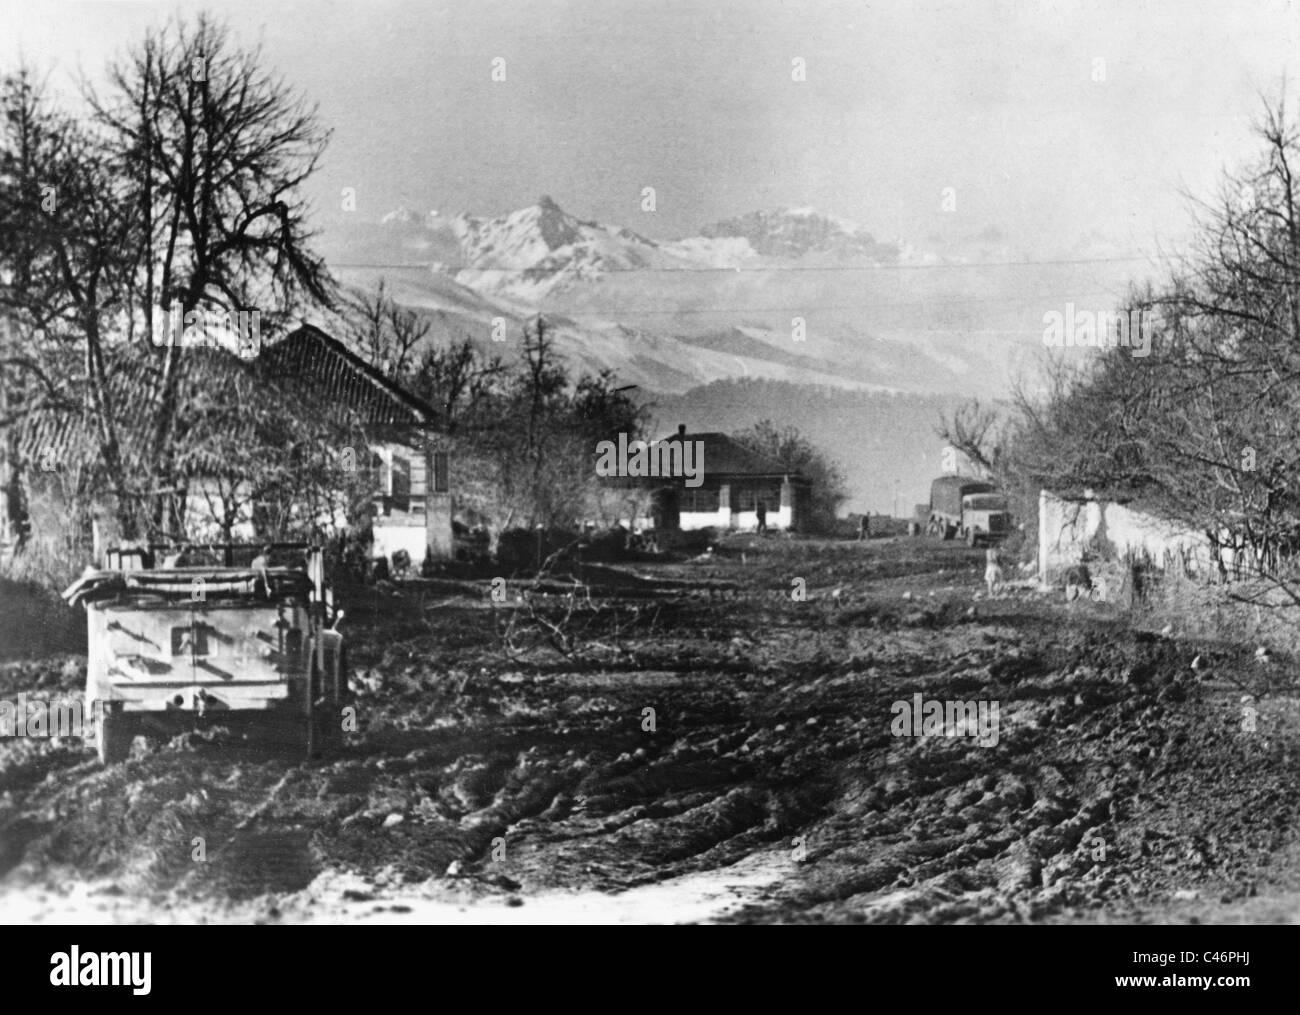 Second World War: Break down in front of Ordzhonikidze, december 1942 - Stock Image